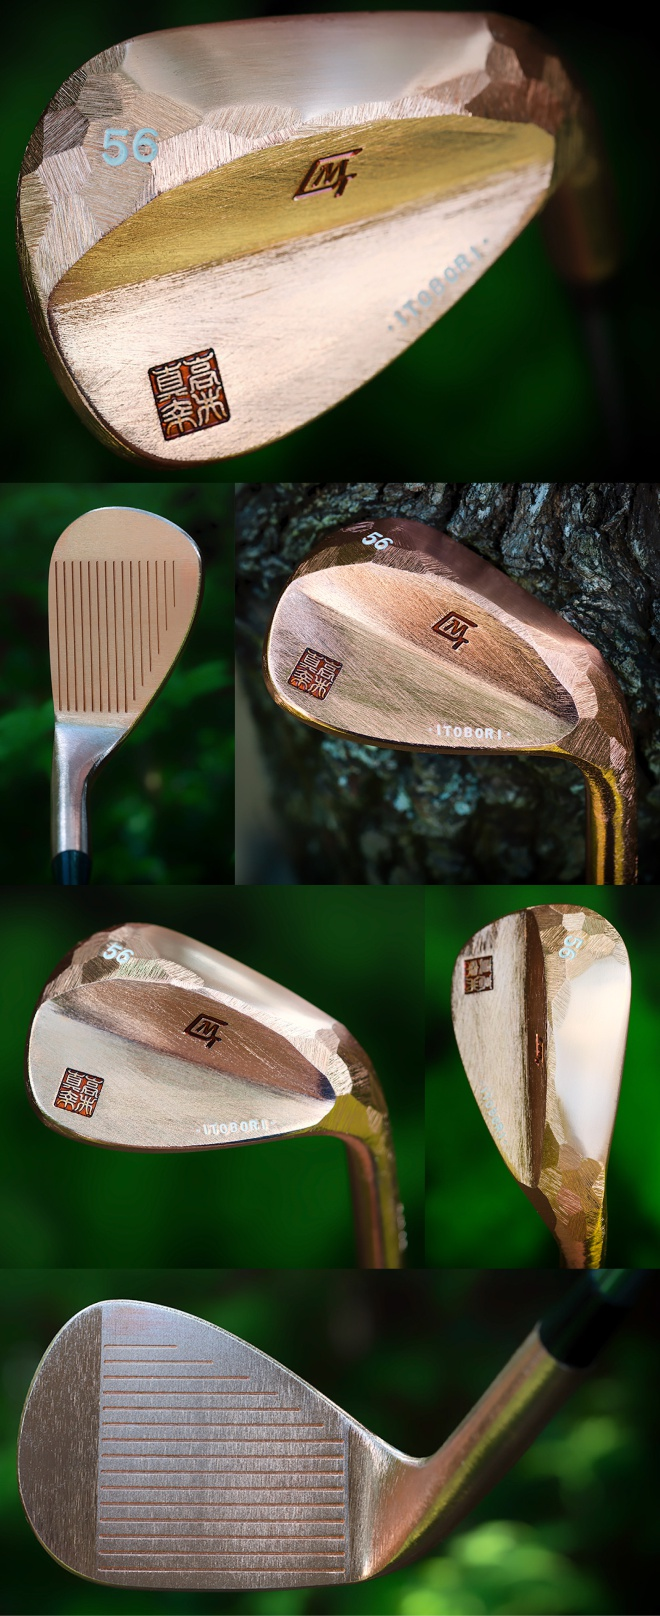 Itobori Copper Wedge